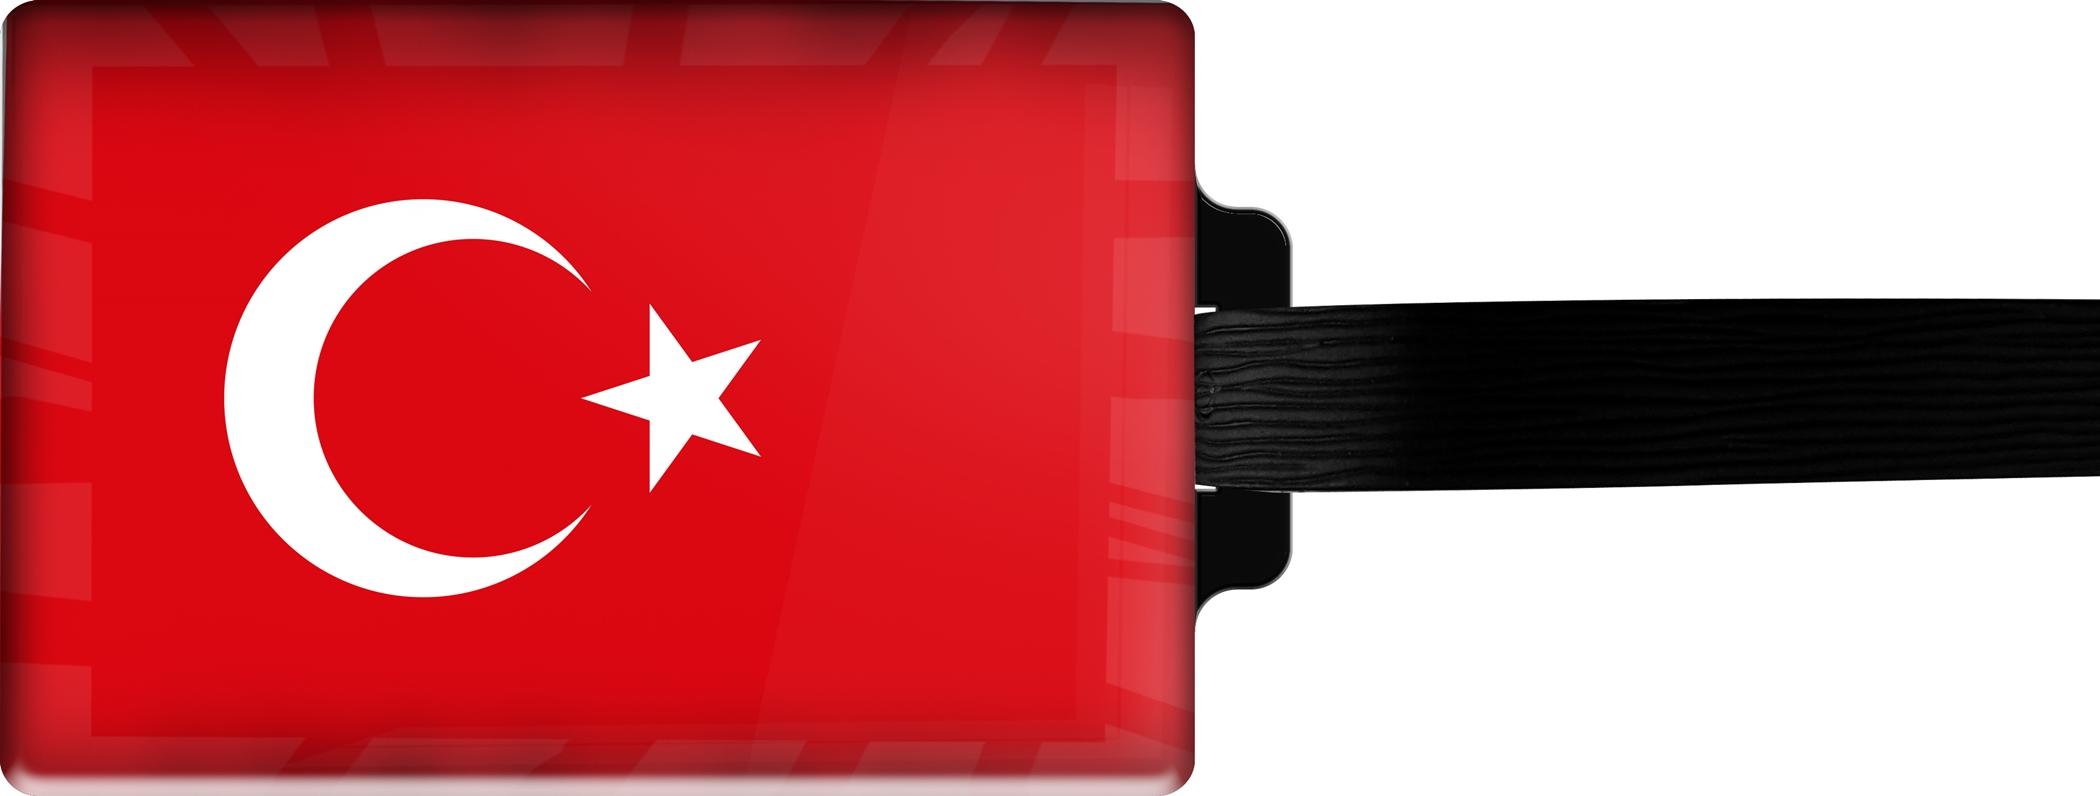 Hochwertiger Gepäckanhänger aus Acrylglas | FLAGGE TÜRKEI | metALUm #00073